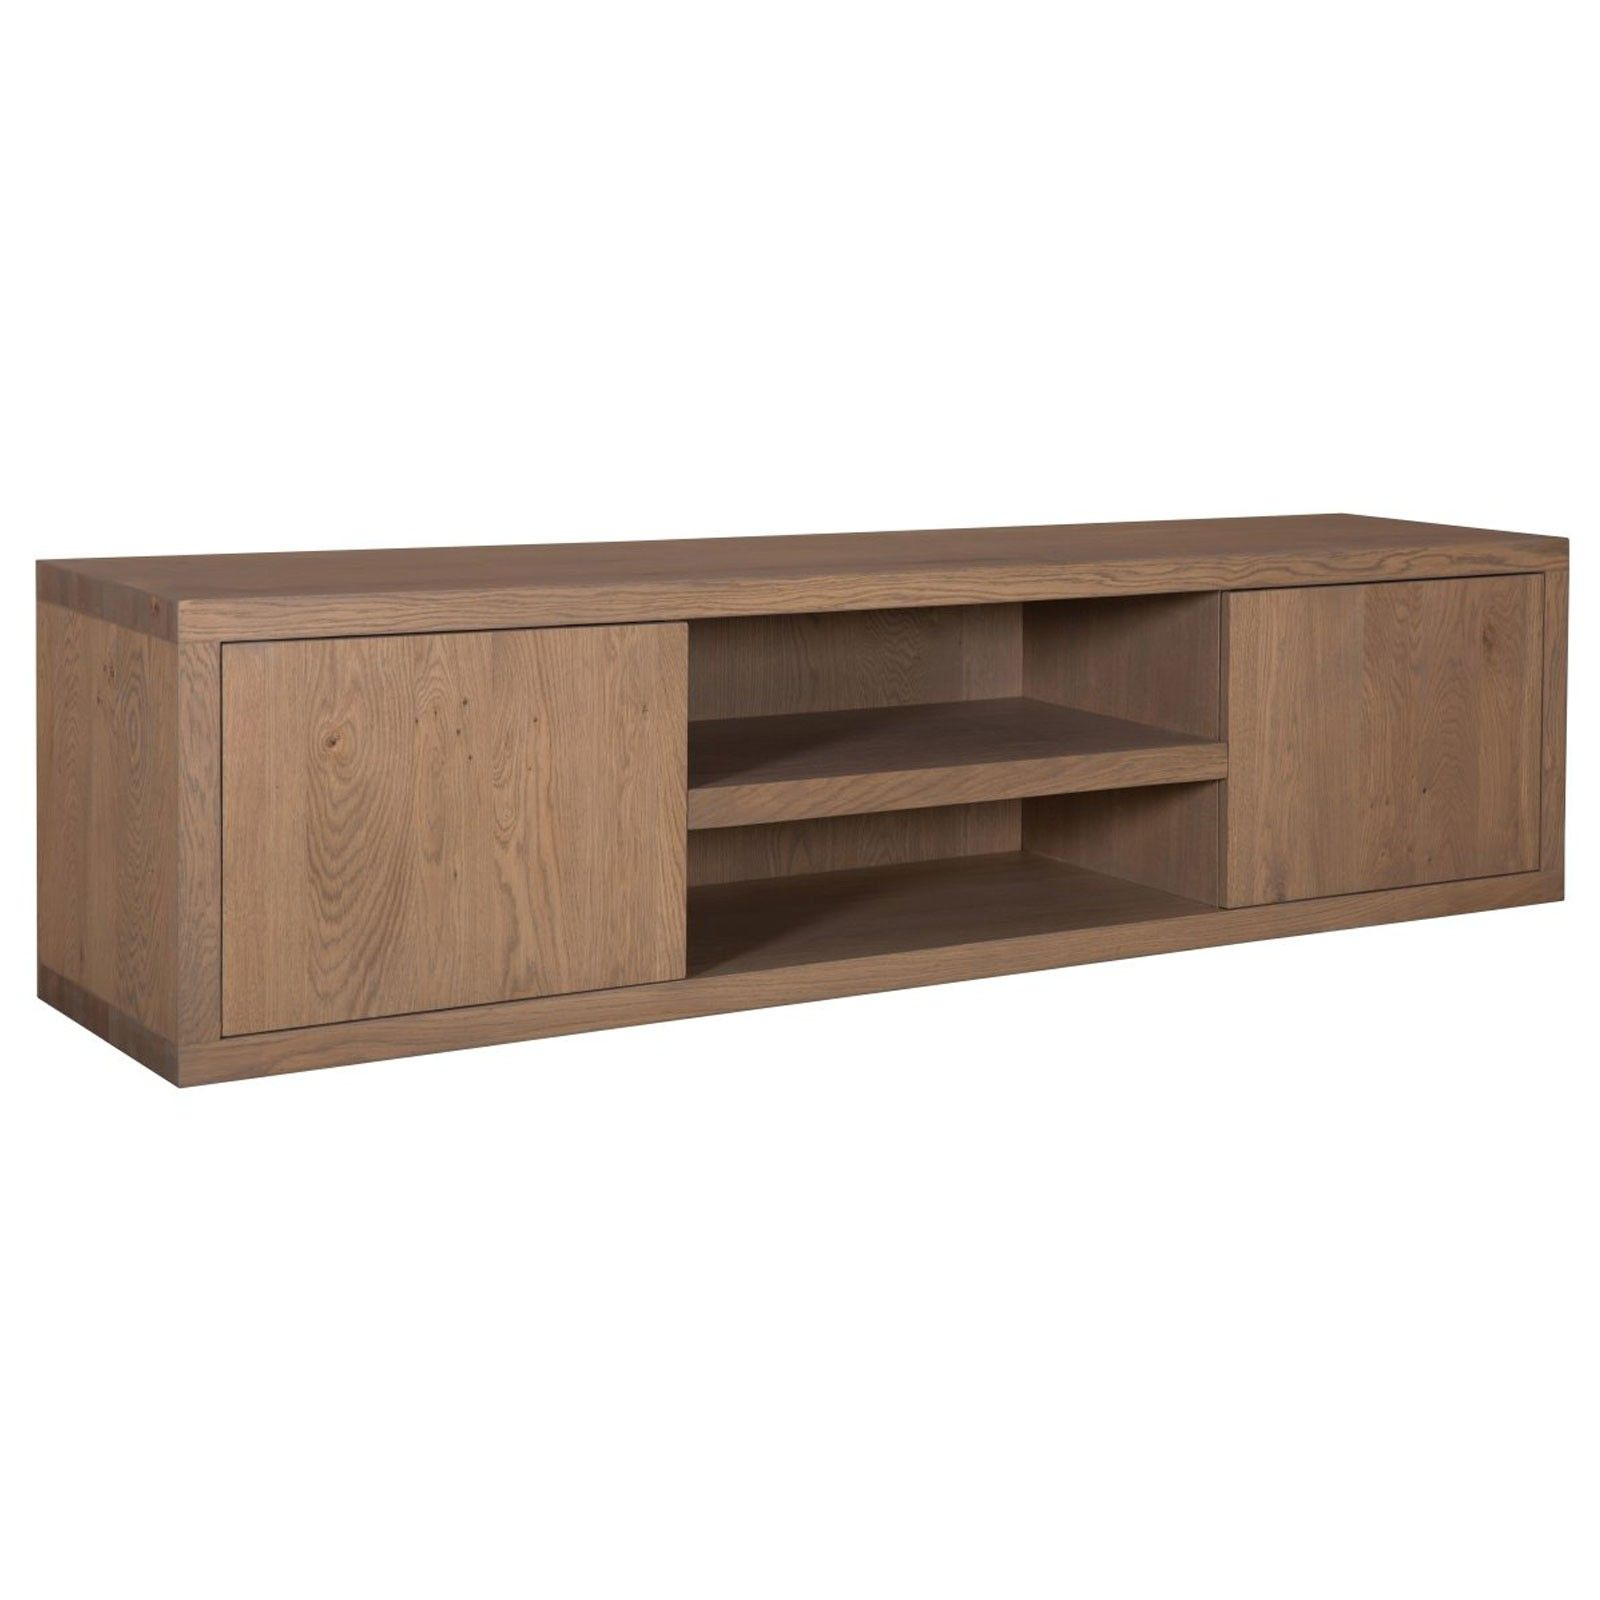 "Meuble TV 2 portes ""Chêne Moderne"" - achat meuble tv"